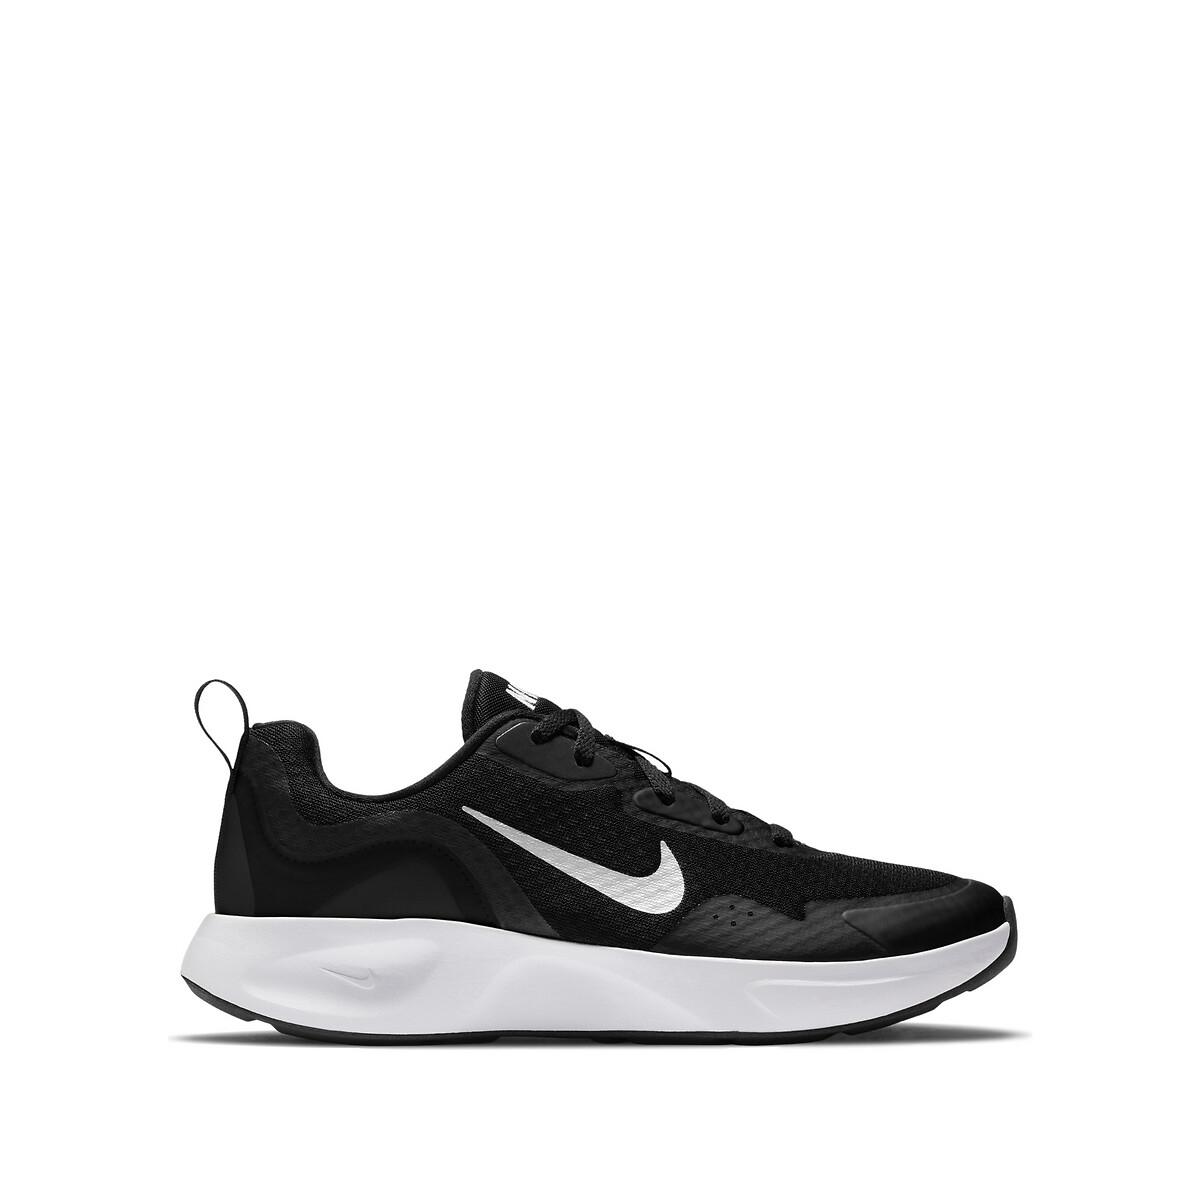 Nike wearallday sneakers zwart/wit dames online kopen